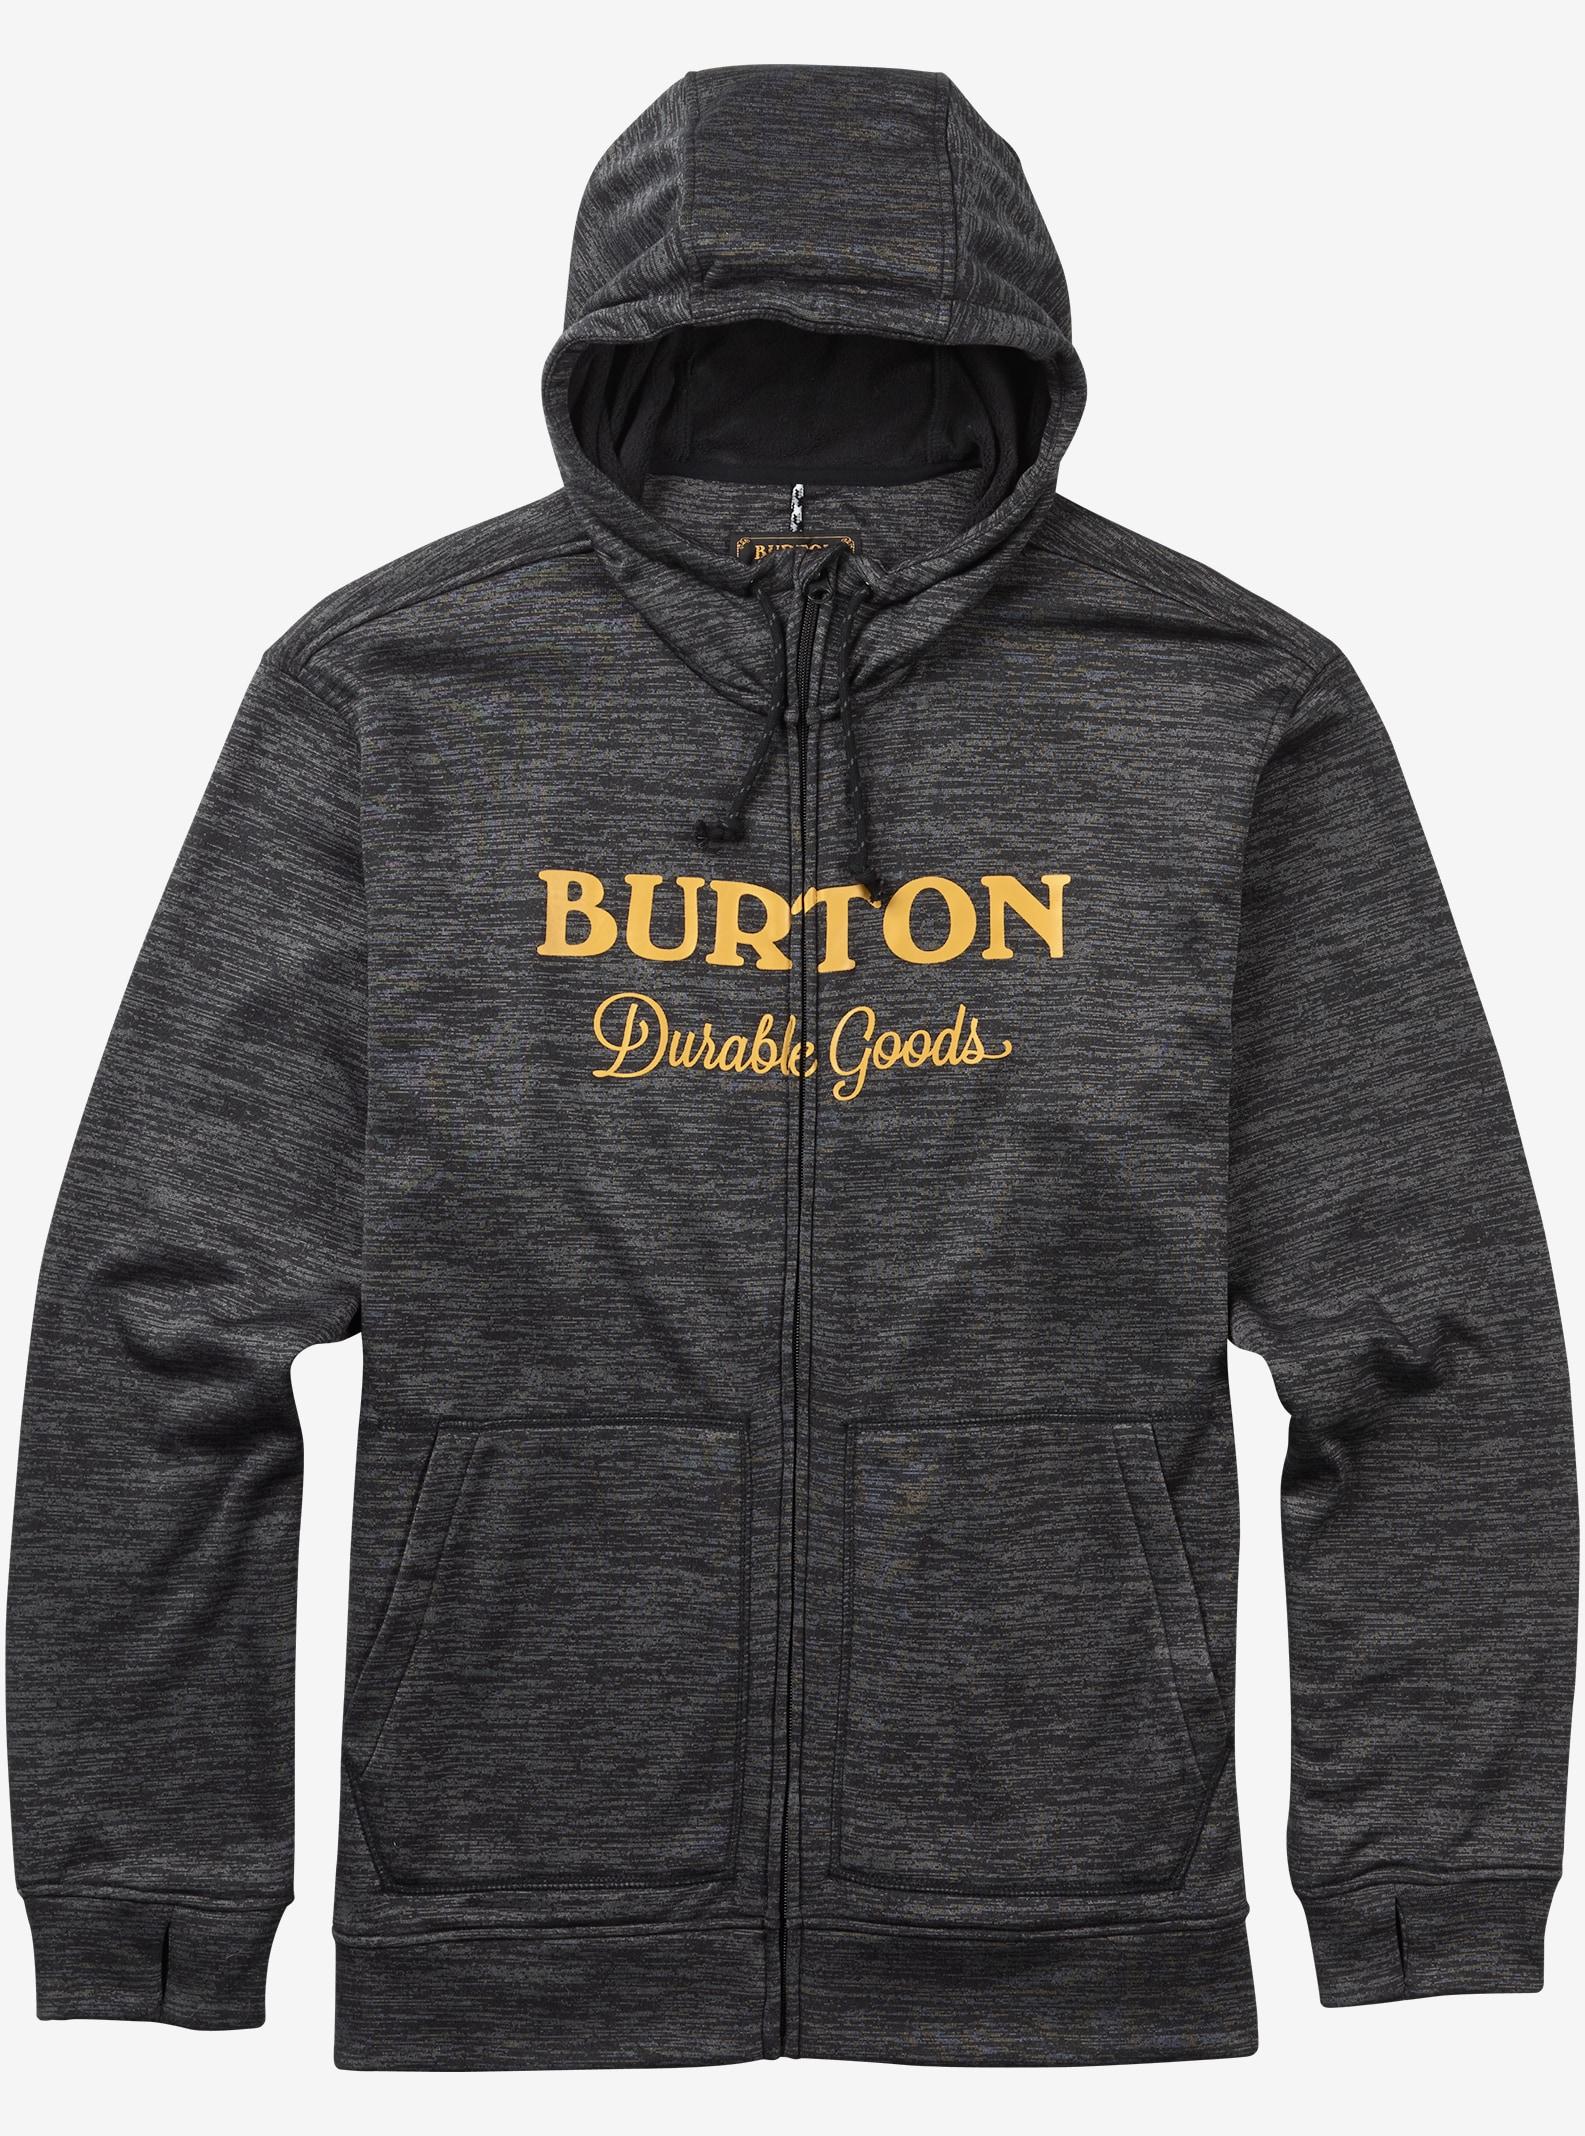 Burton Oak Full-Zip Hoodie shown in True Black Heather